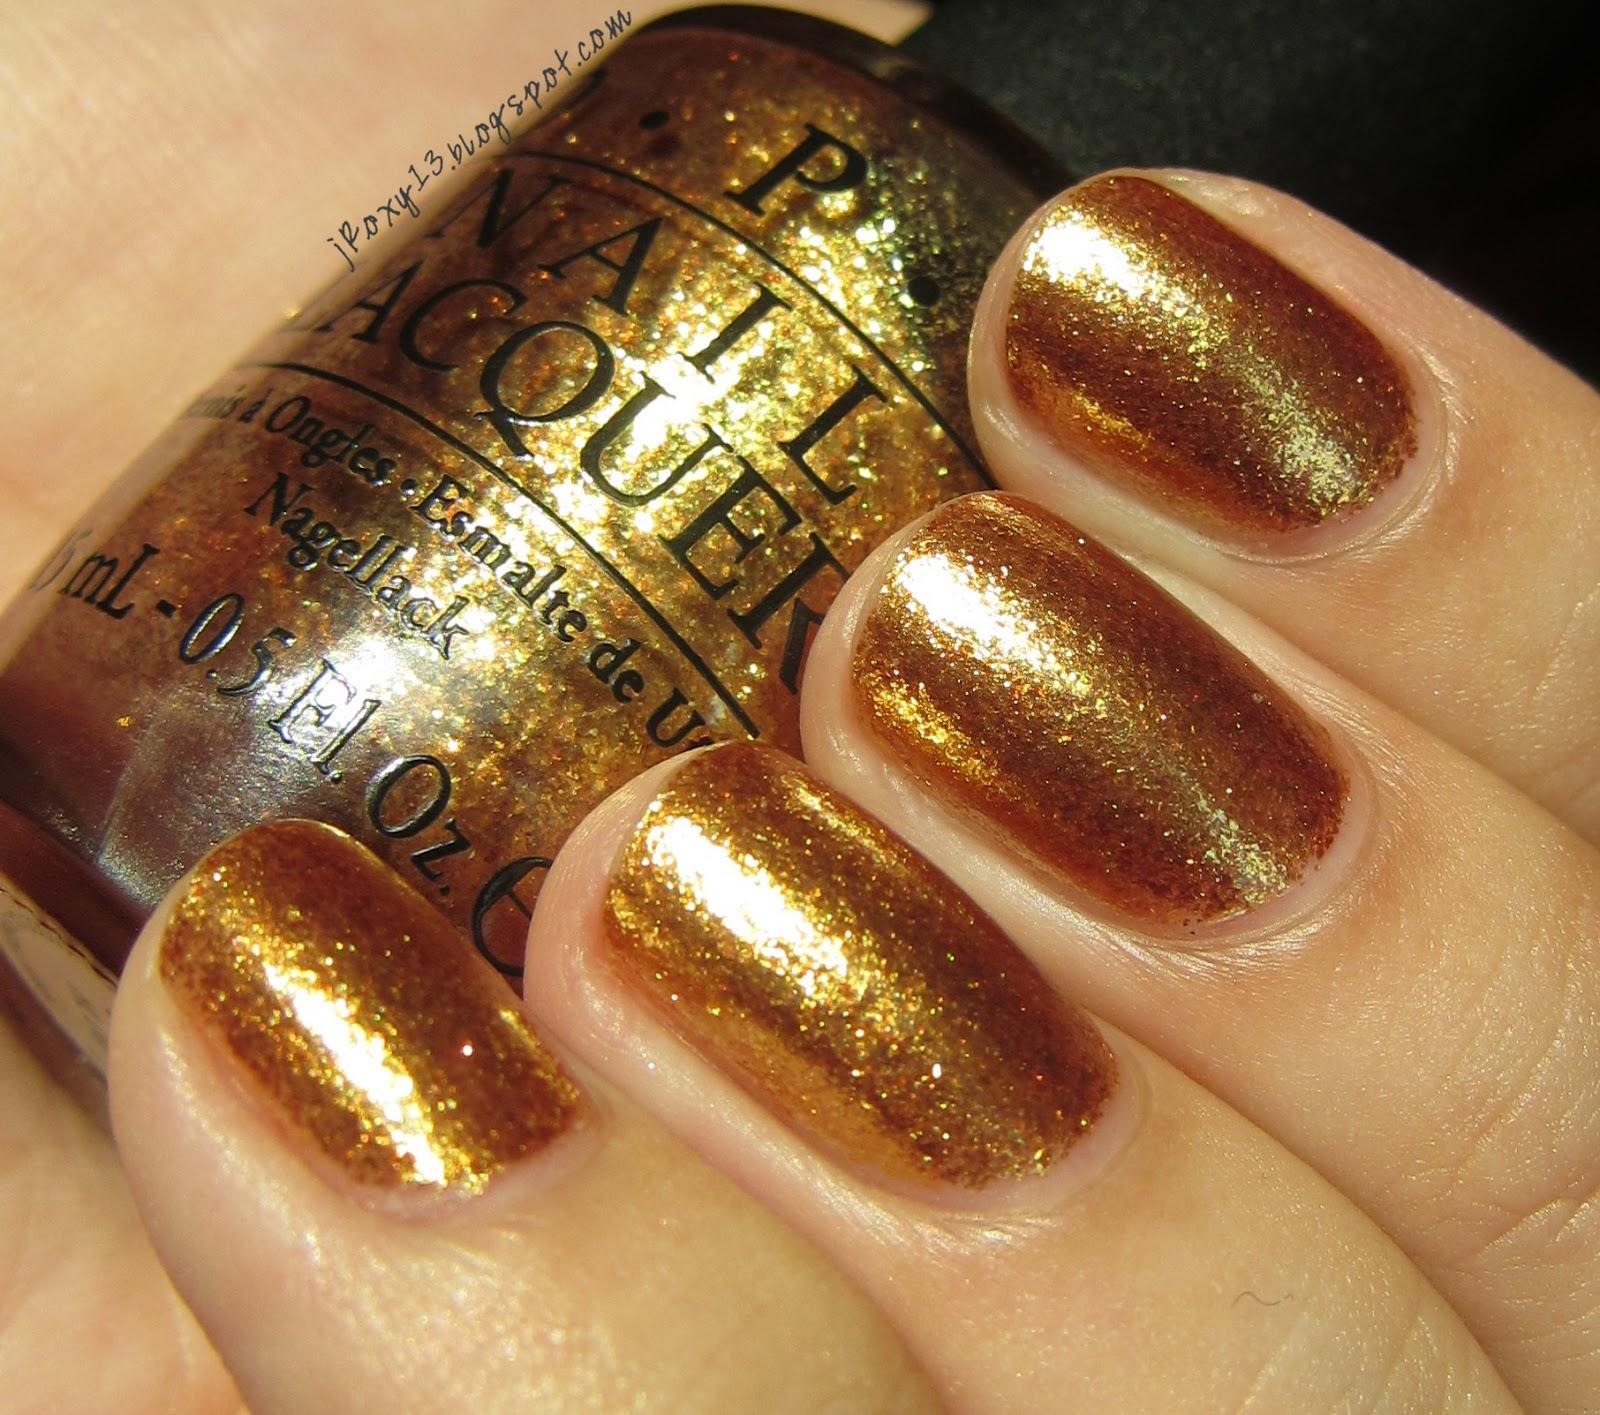 Opi Goldeneye OPI in GoldenEye + Com...